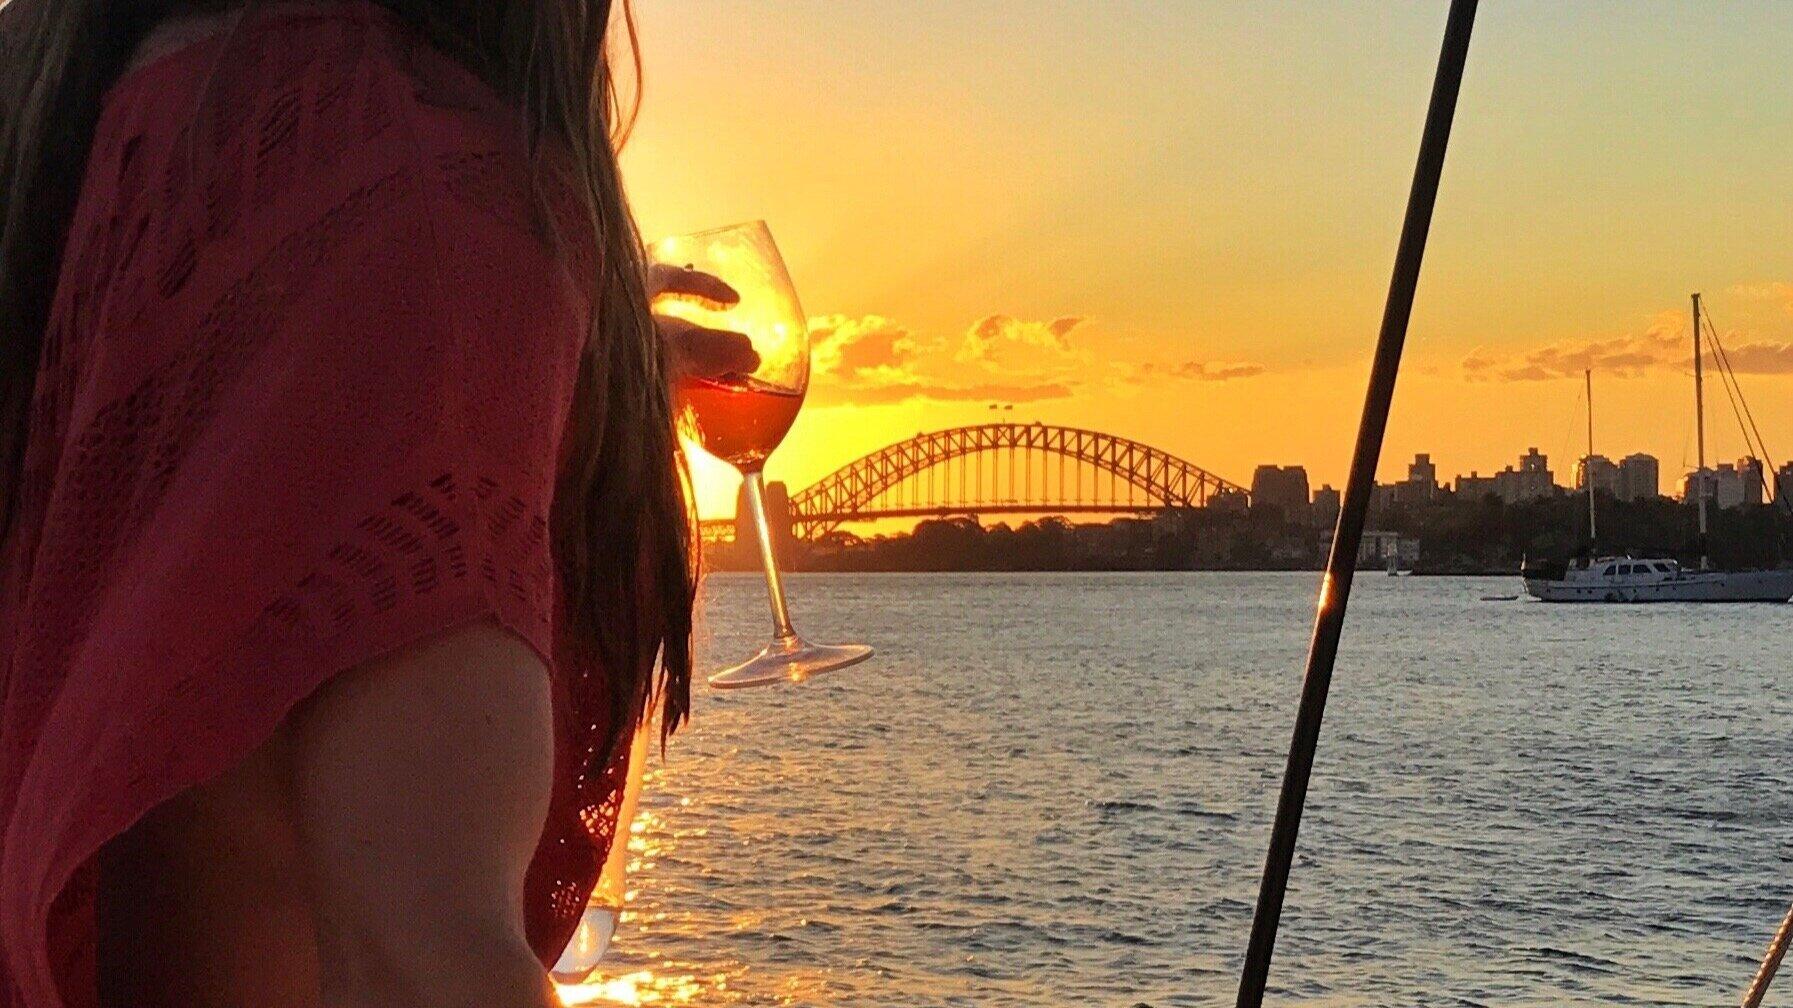 BAREFOOT+Sunset+Glass+of+wine.jpg